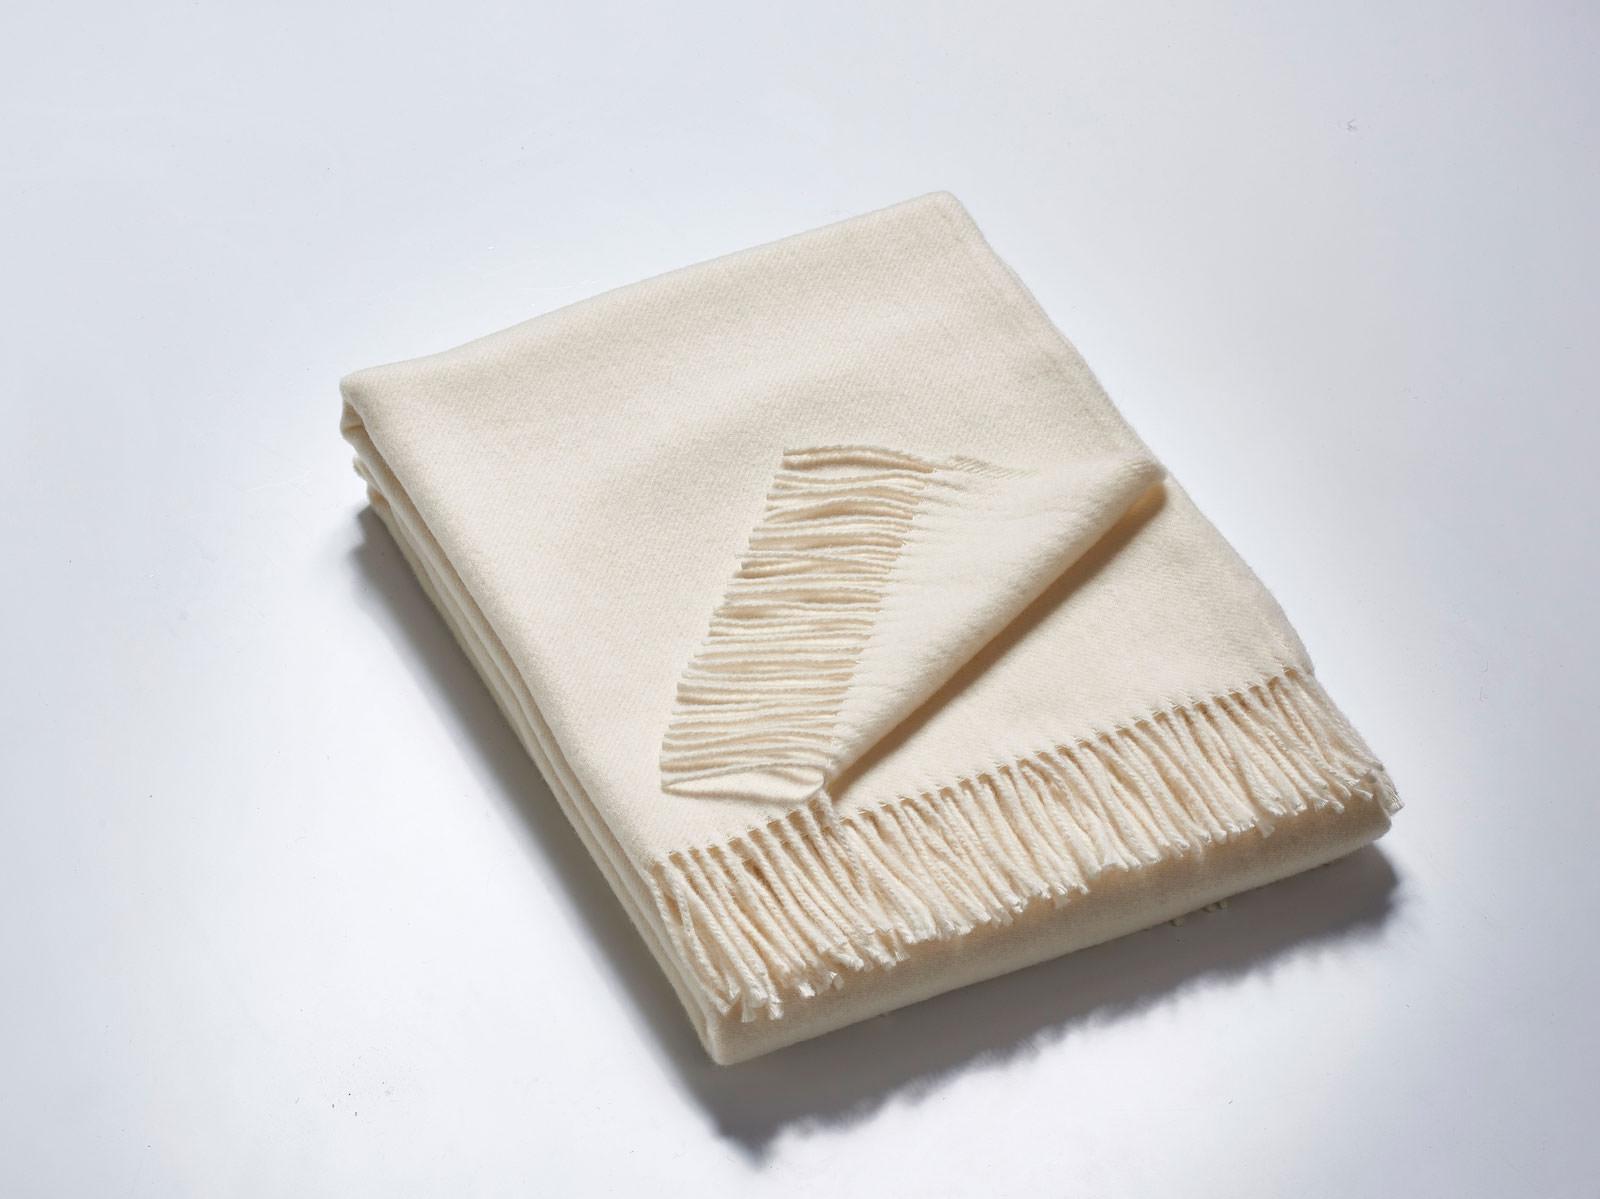 Das Plaid – Merino-Decke 140 cm x 190 cm (850 g)